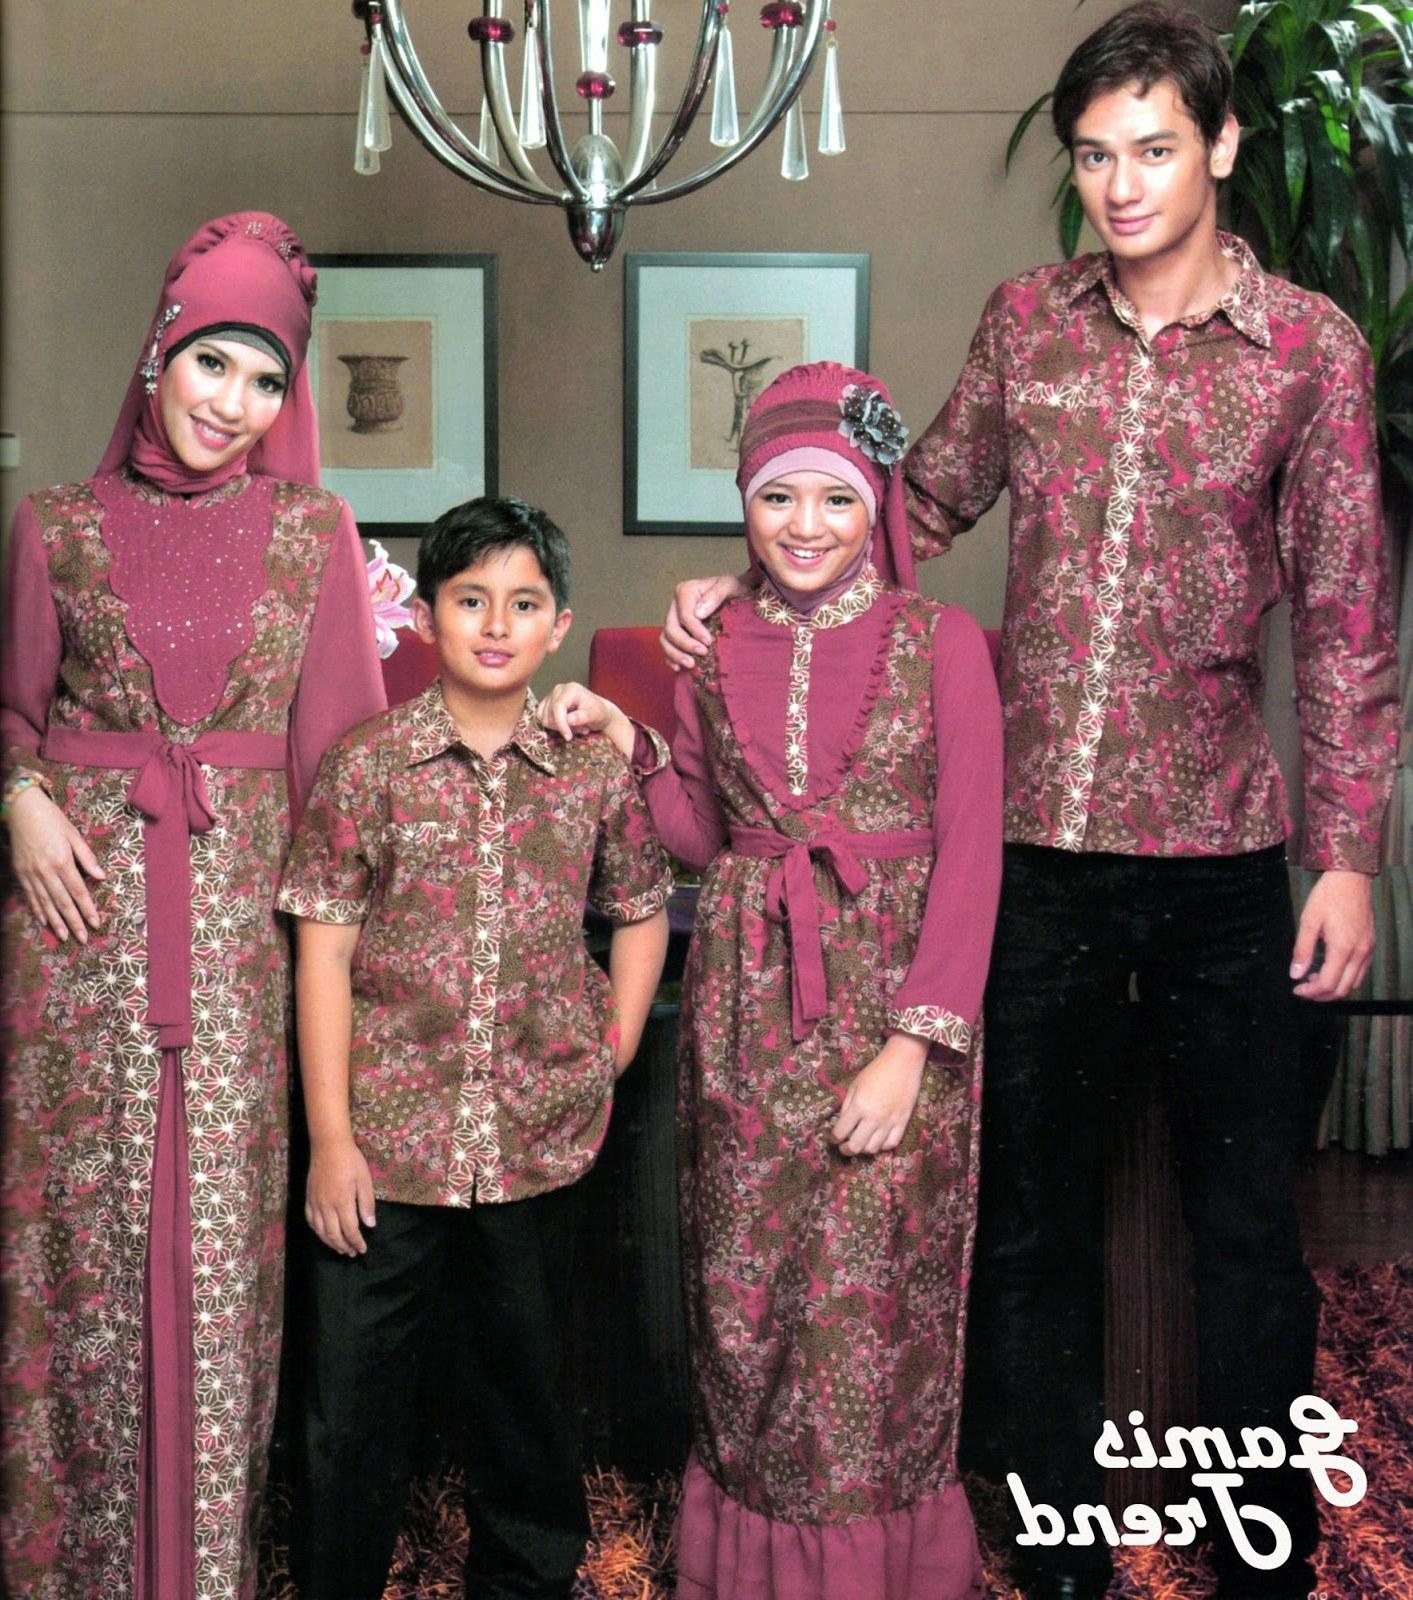 Model Baju Lebaran Keluarga Batik 0gdr Model Terbaik Baju Batik Keluarga Muslim Untuk Lebaran